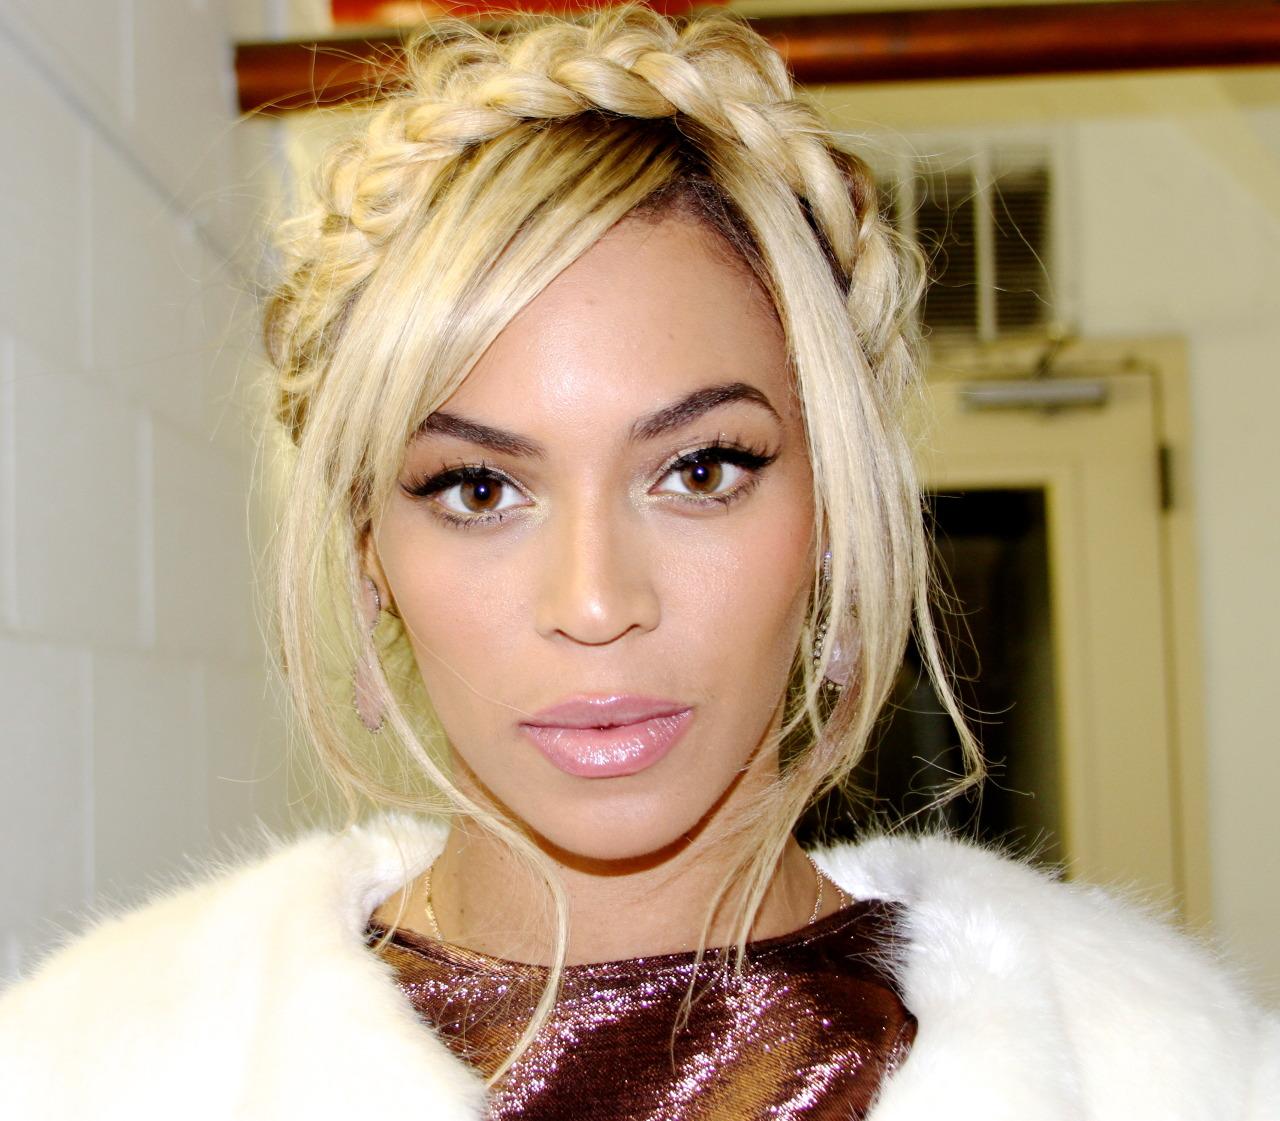 Beyoncé - Twitter (@Beyonce), Instagram (Baddiebey), Tumblr (I Am...) [II] - Página 3 Tumblr_n0z02kOoA21rqgjz2o1_1280